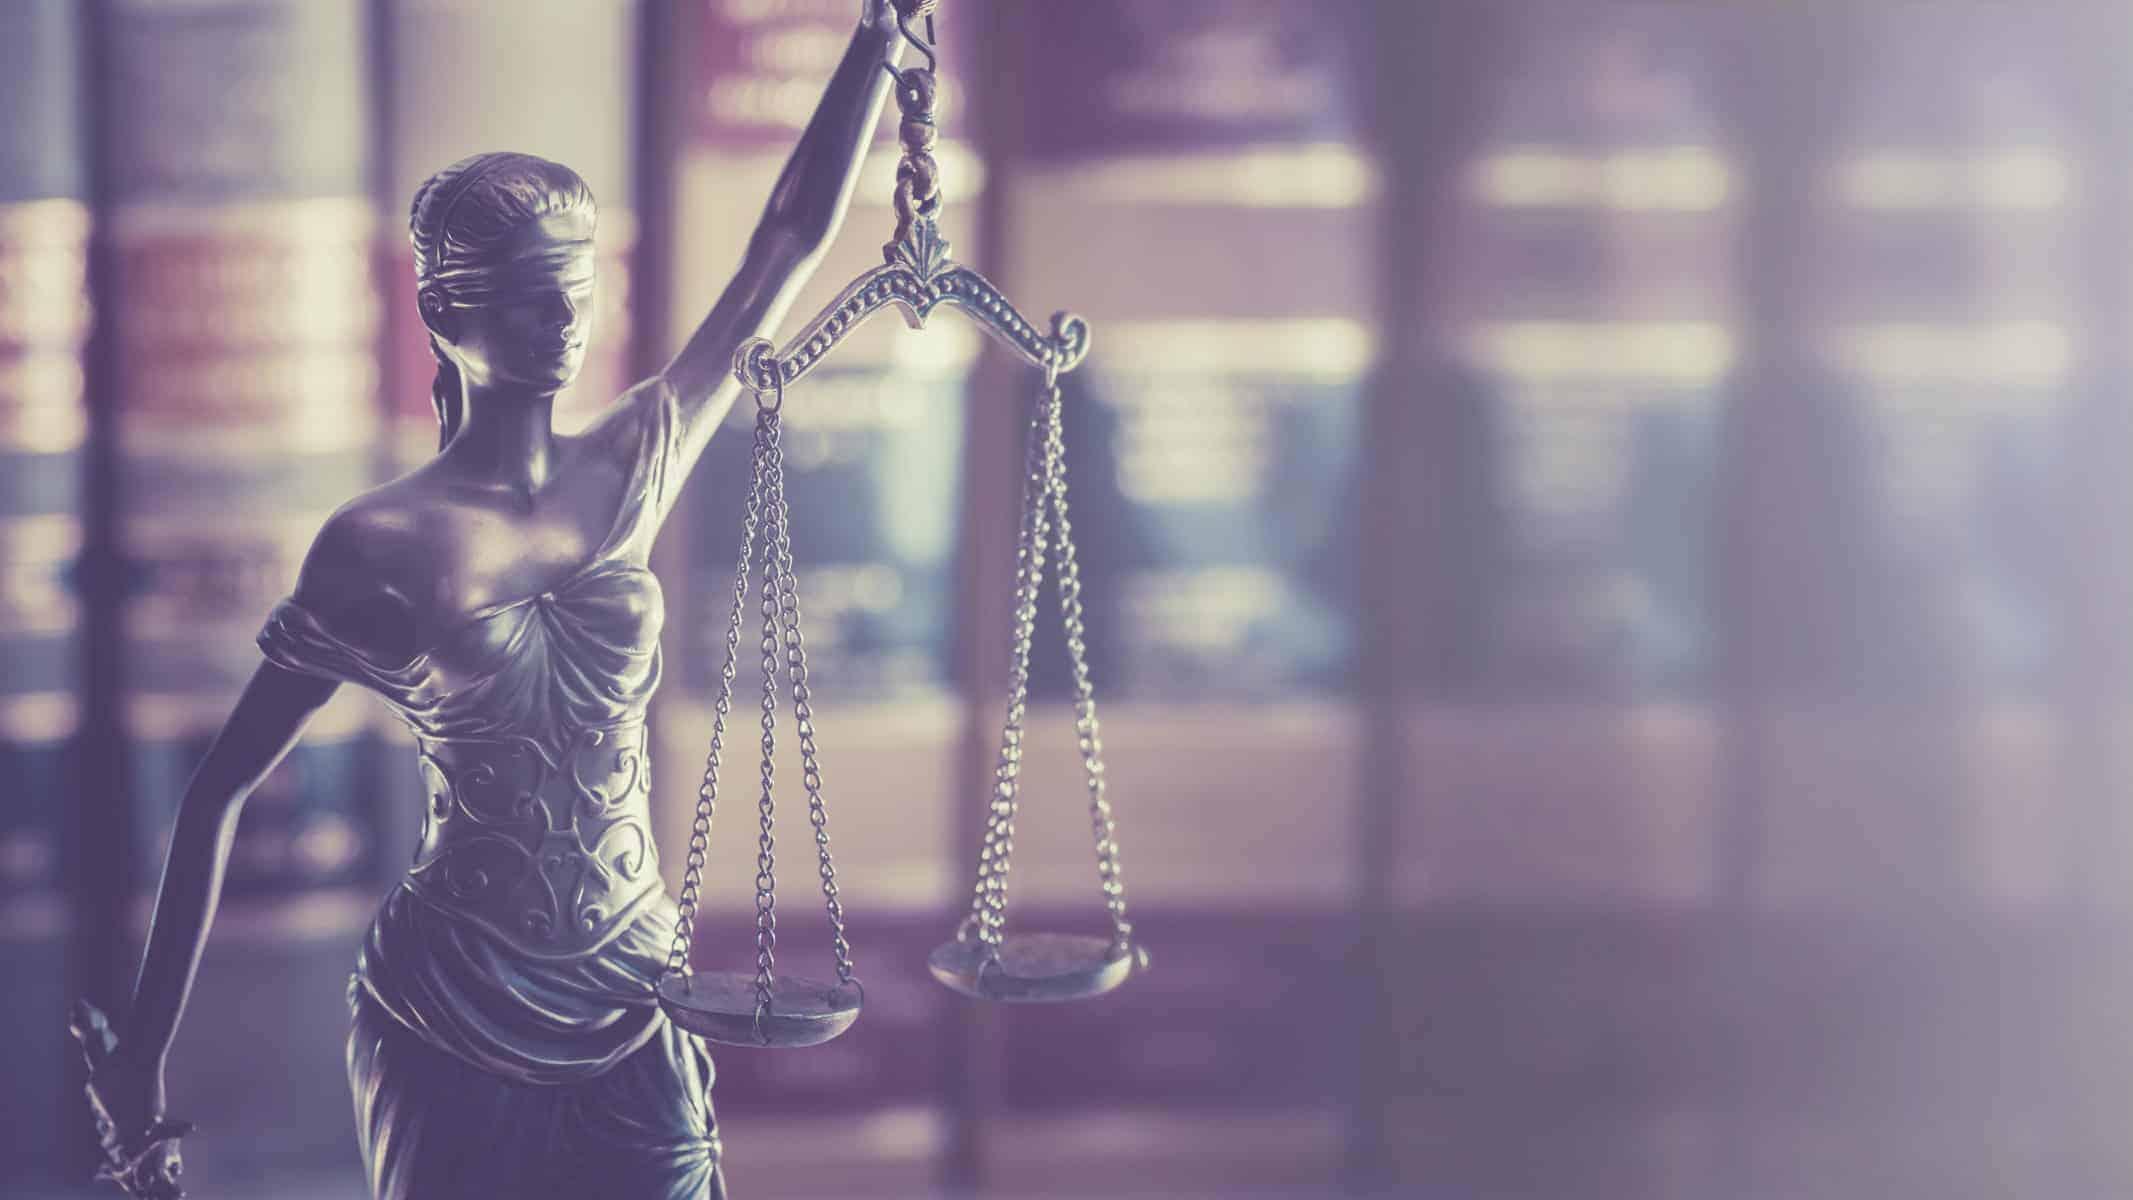 Legal Concept 16.9